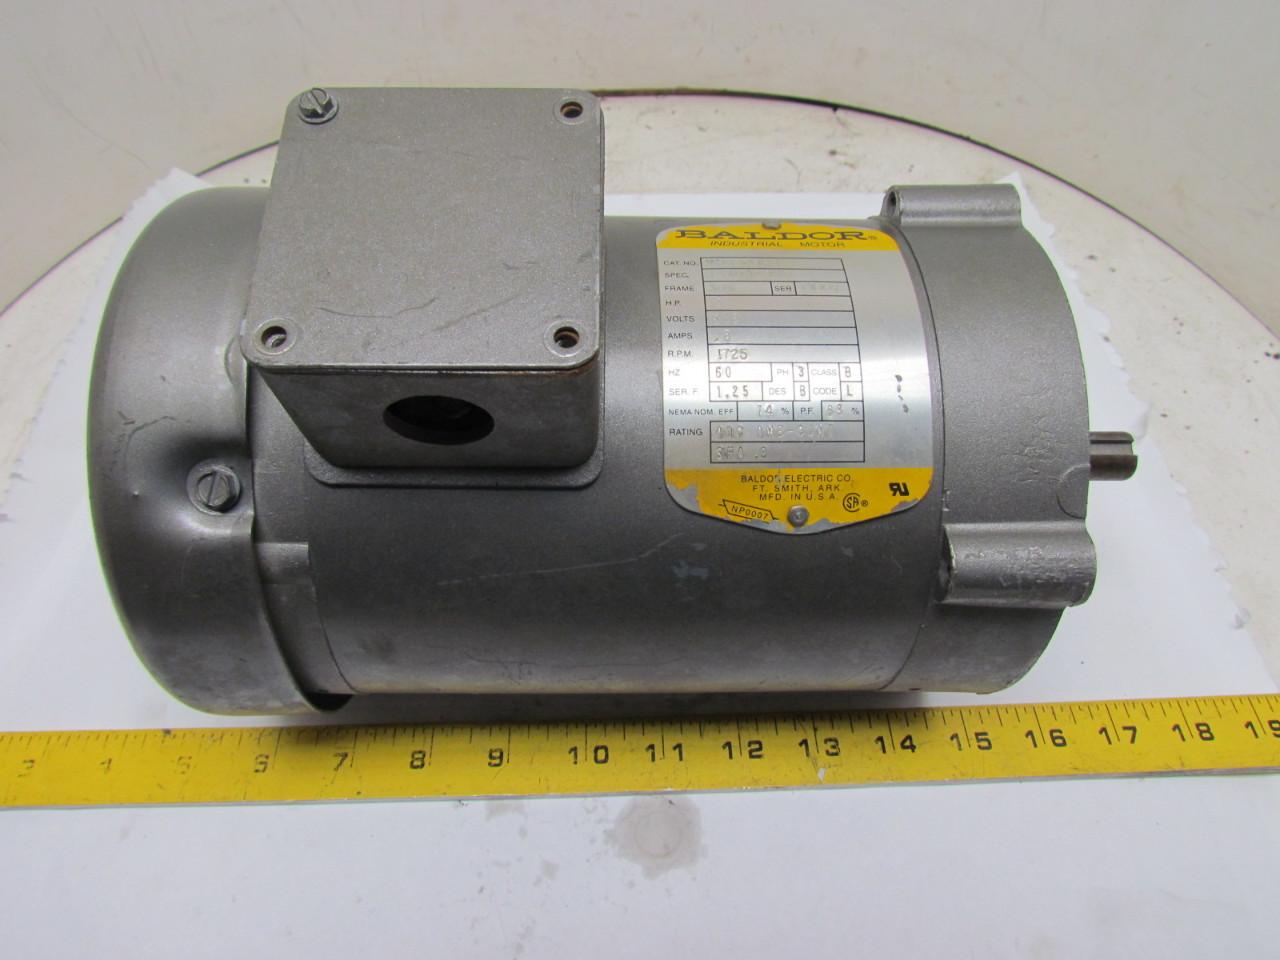 Baldor vm3538 5 34a63 873 3 phase electric motor 1 2hp for 56c frame motor dimensions